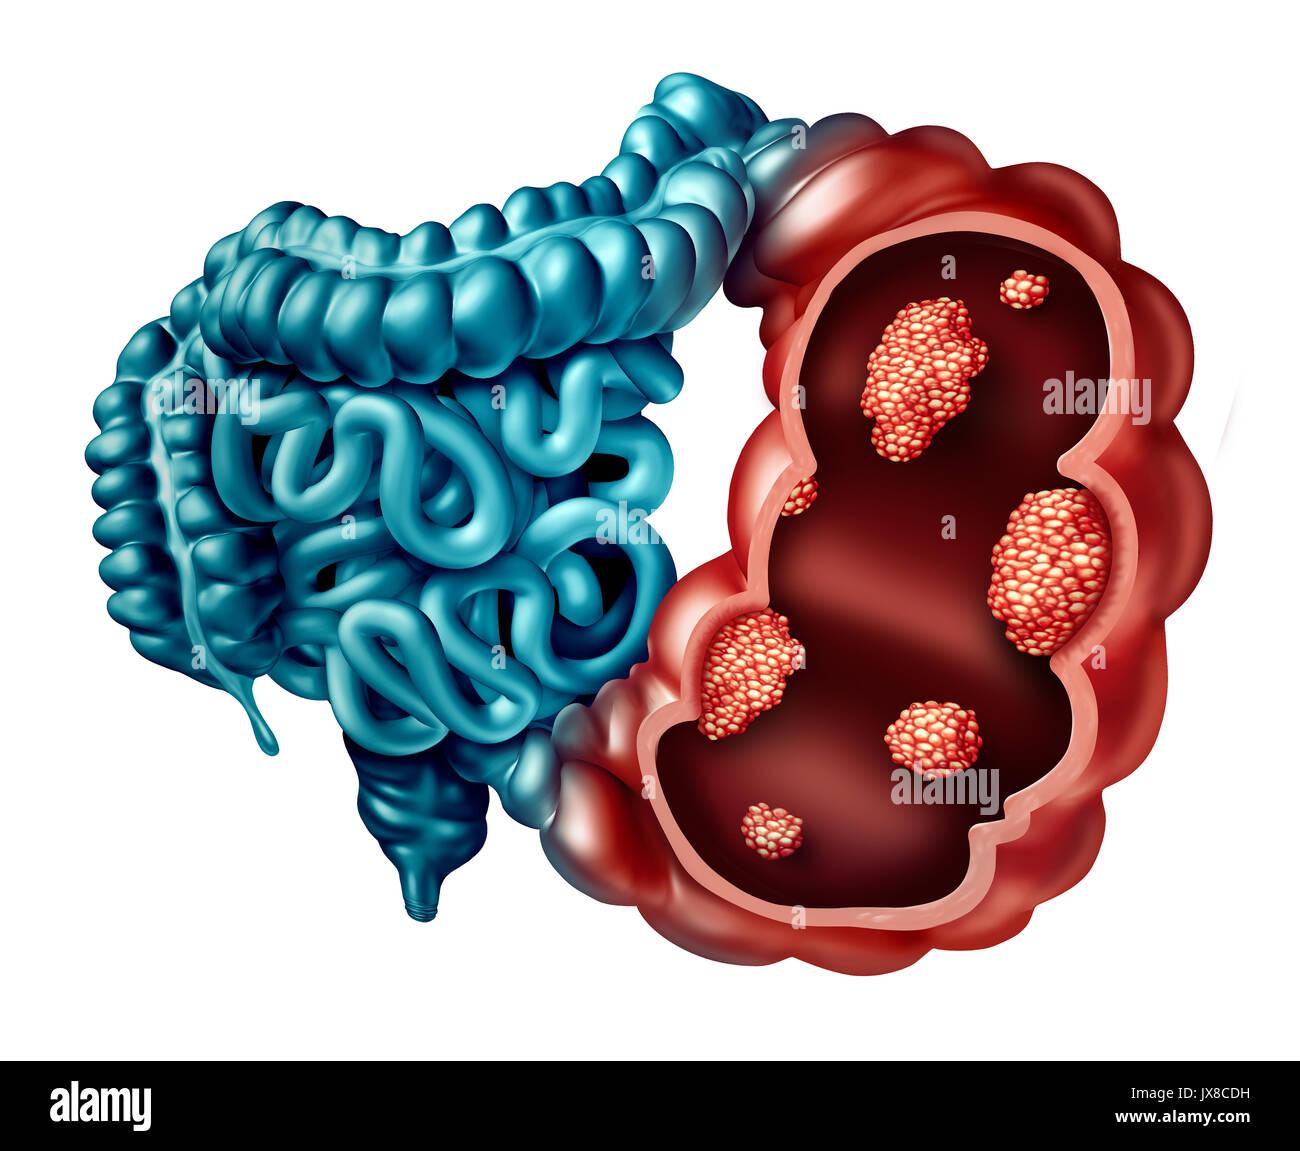 Colon Cancer Imágenes De Stock & Colon Cancer Fotos De Stock - Alamy